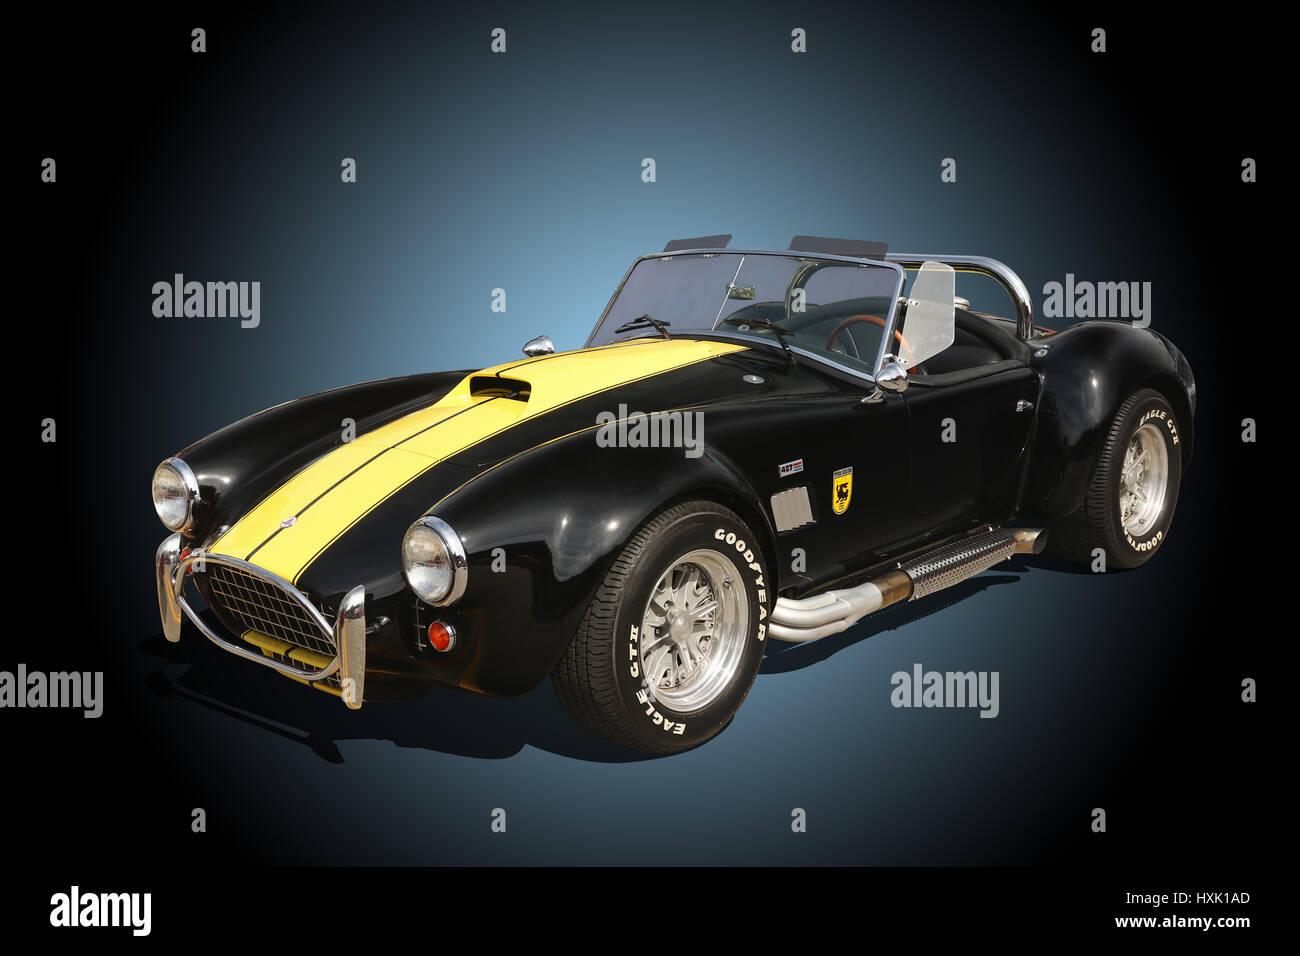 Auto- 1964 AC Cobra. Ford Shelby Cobra 427. Black with Yellow Stock Photo: 136871797 - Alamy